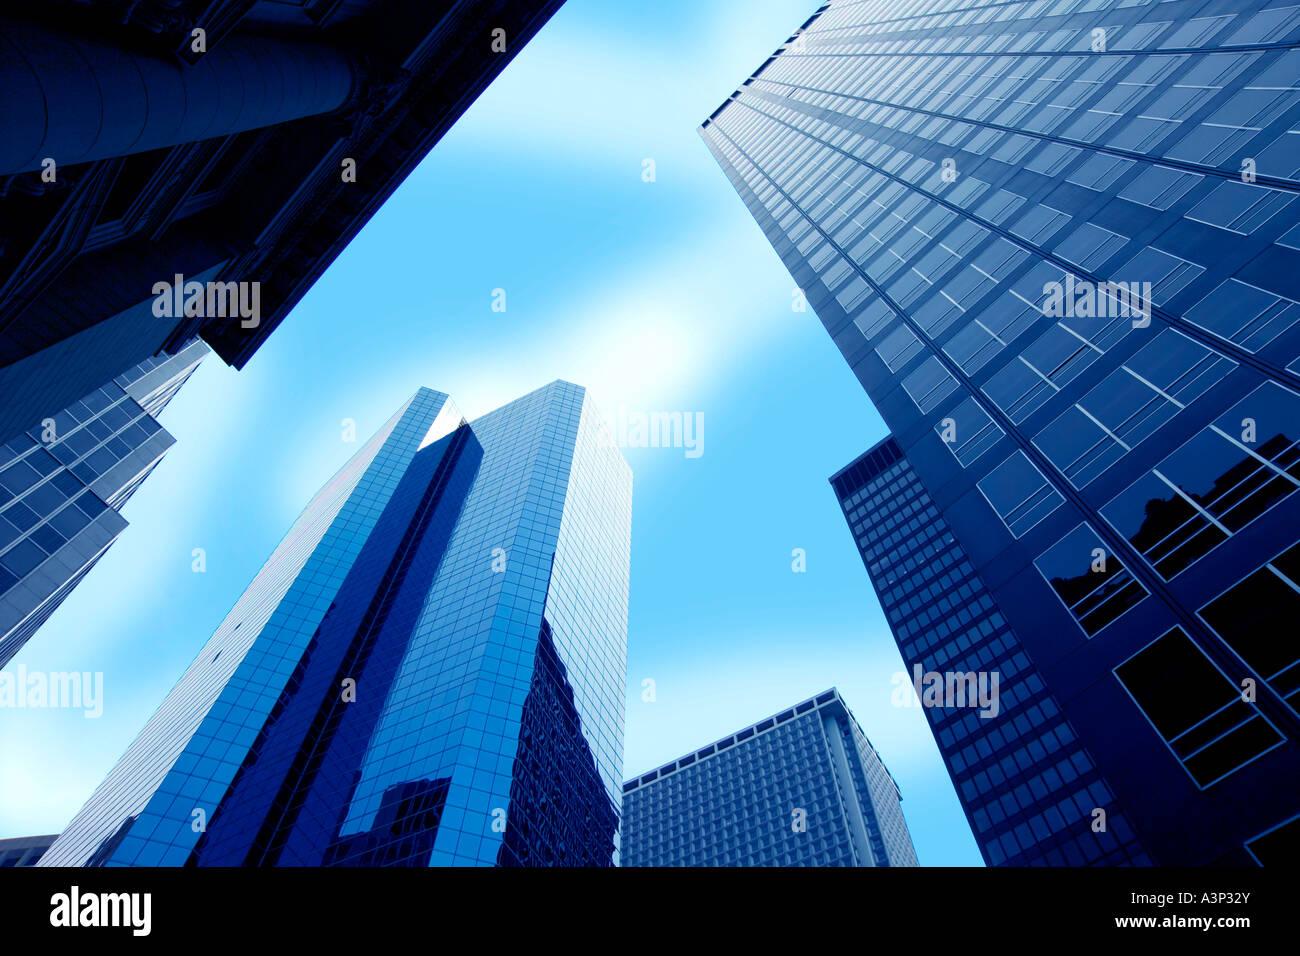 Building horizontal - Stock Image